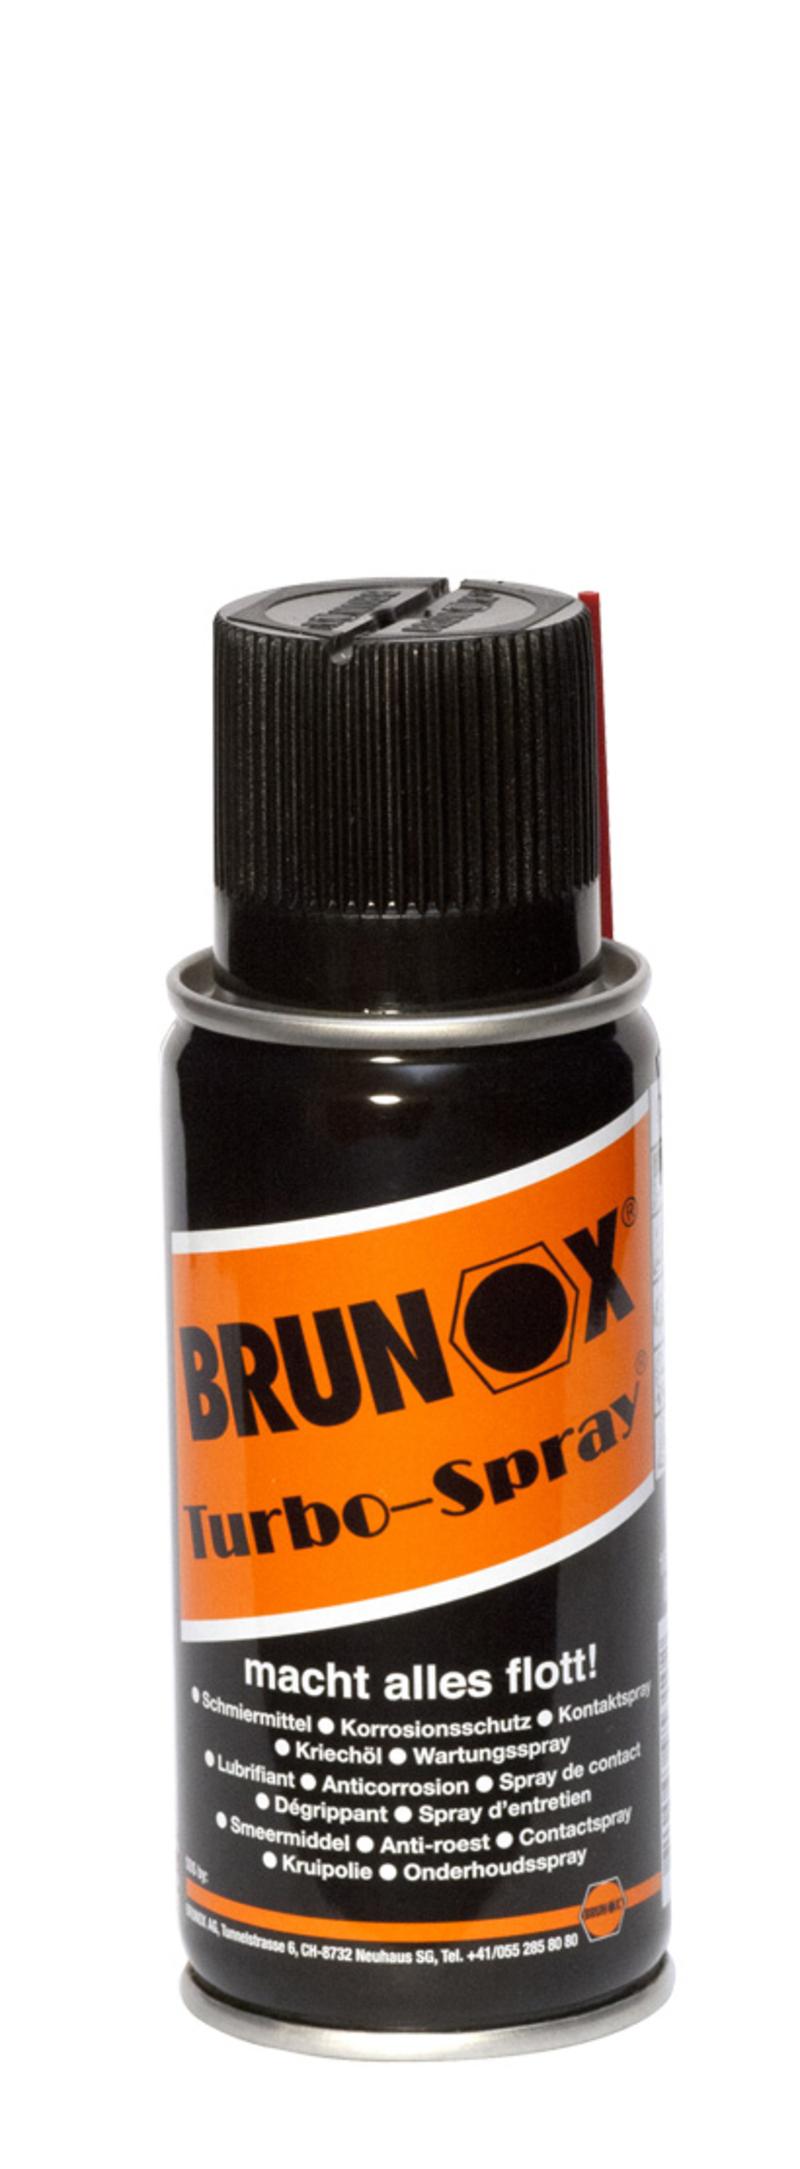 Brunox TURBO - SPRAY 100 ml